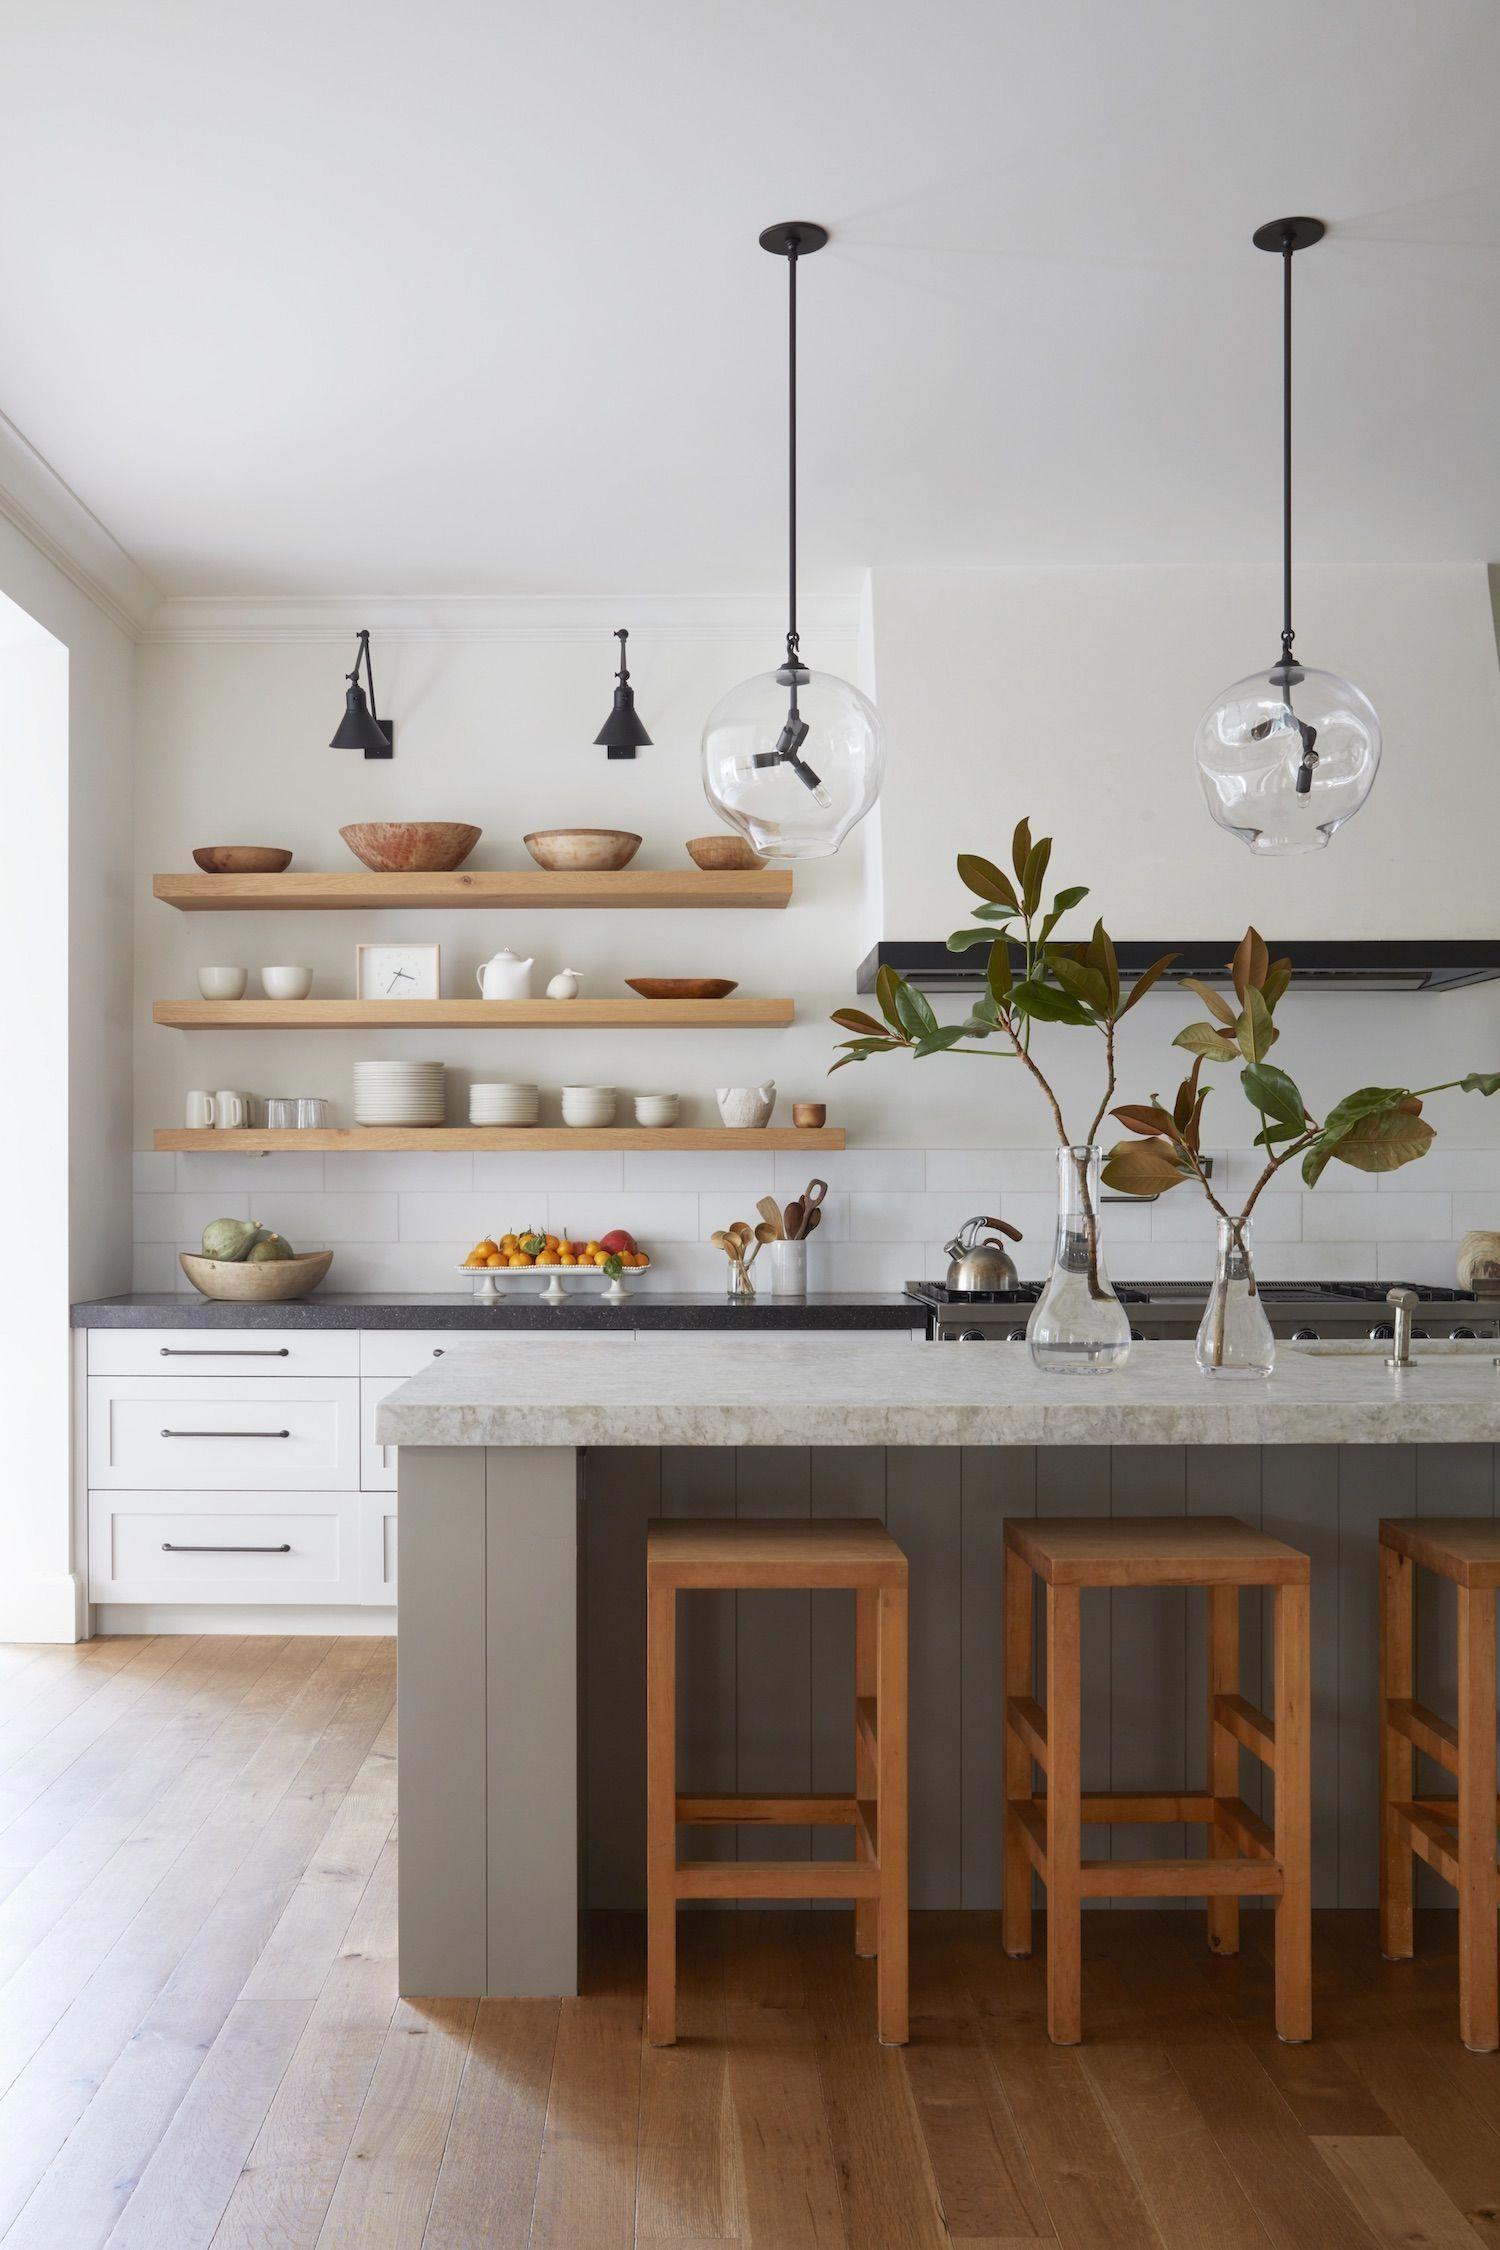 Color Palette, Overall Simplicity   M. Elle Design   Brentwood ...